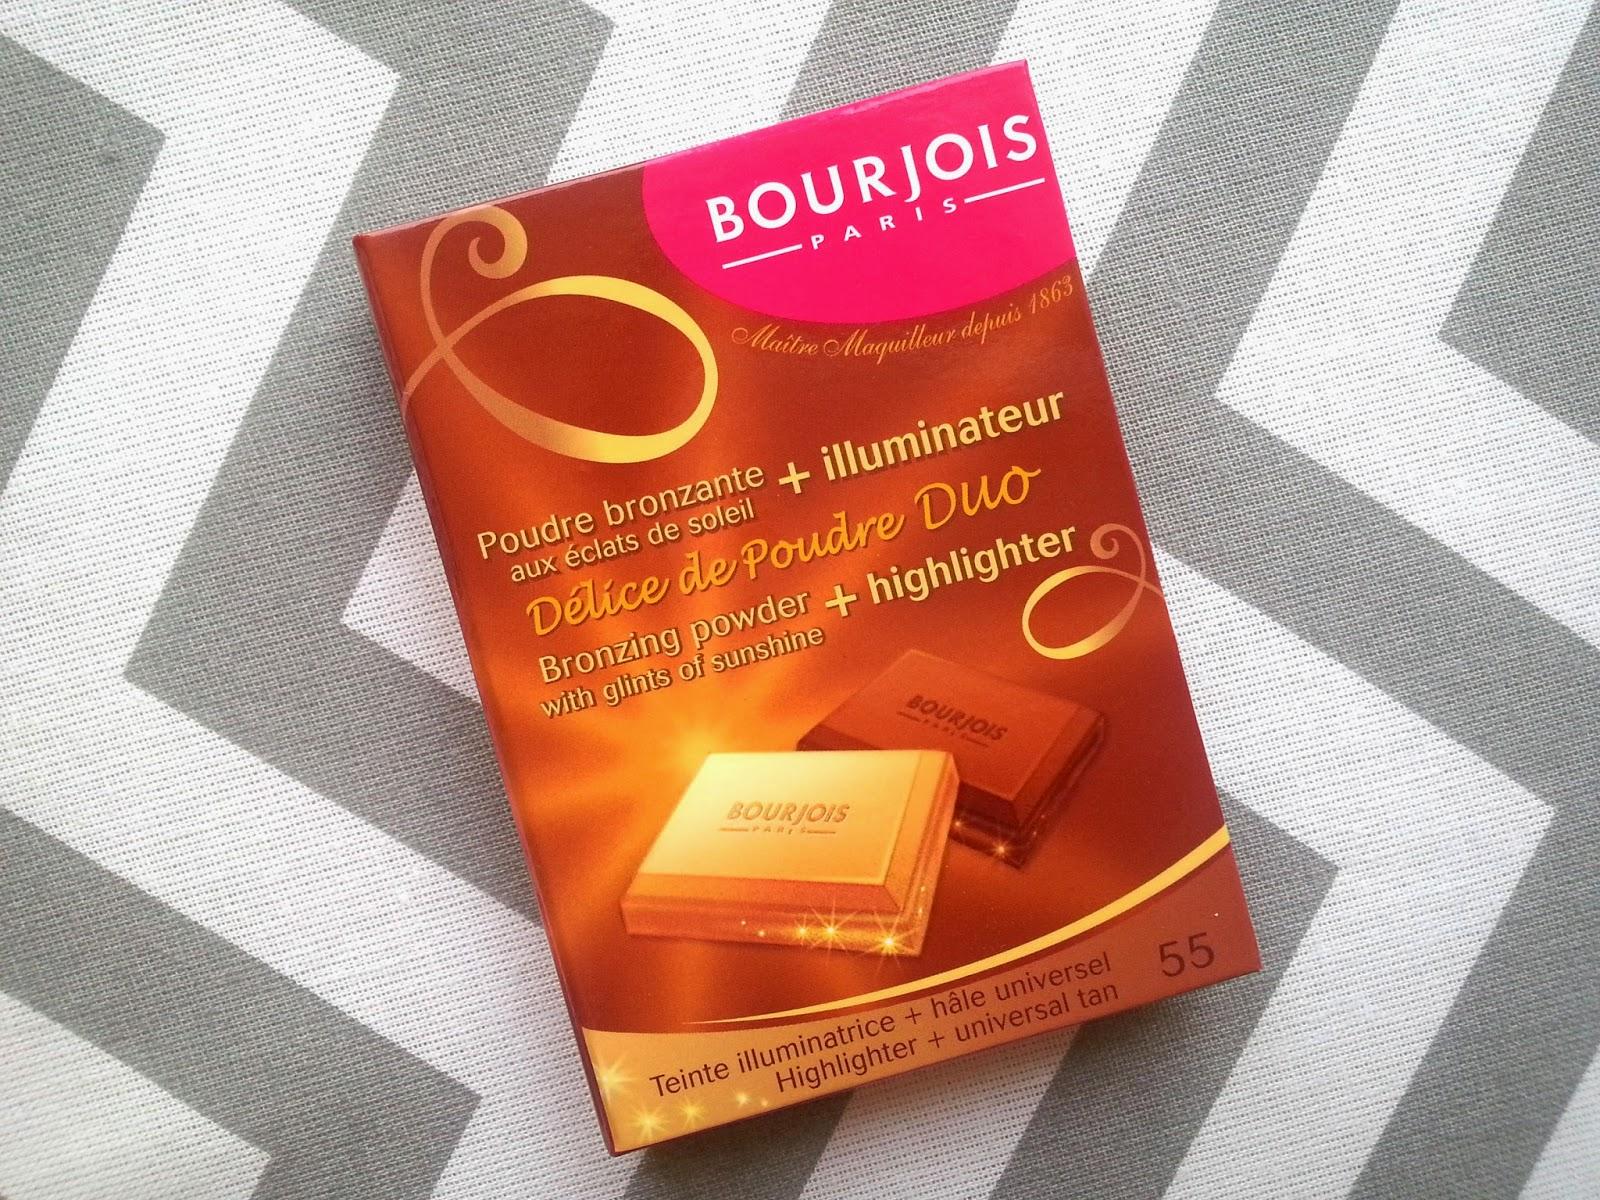 Bourjois Bronzing Powder & Highlighter Duo Review Swatches